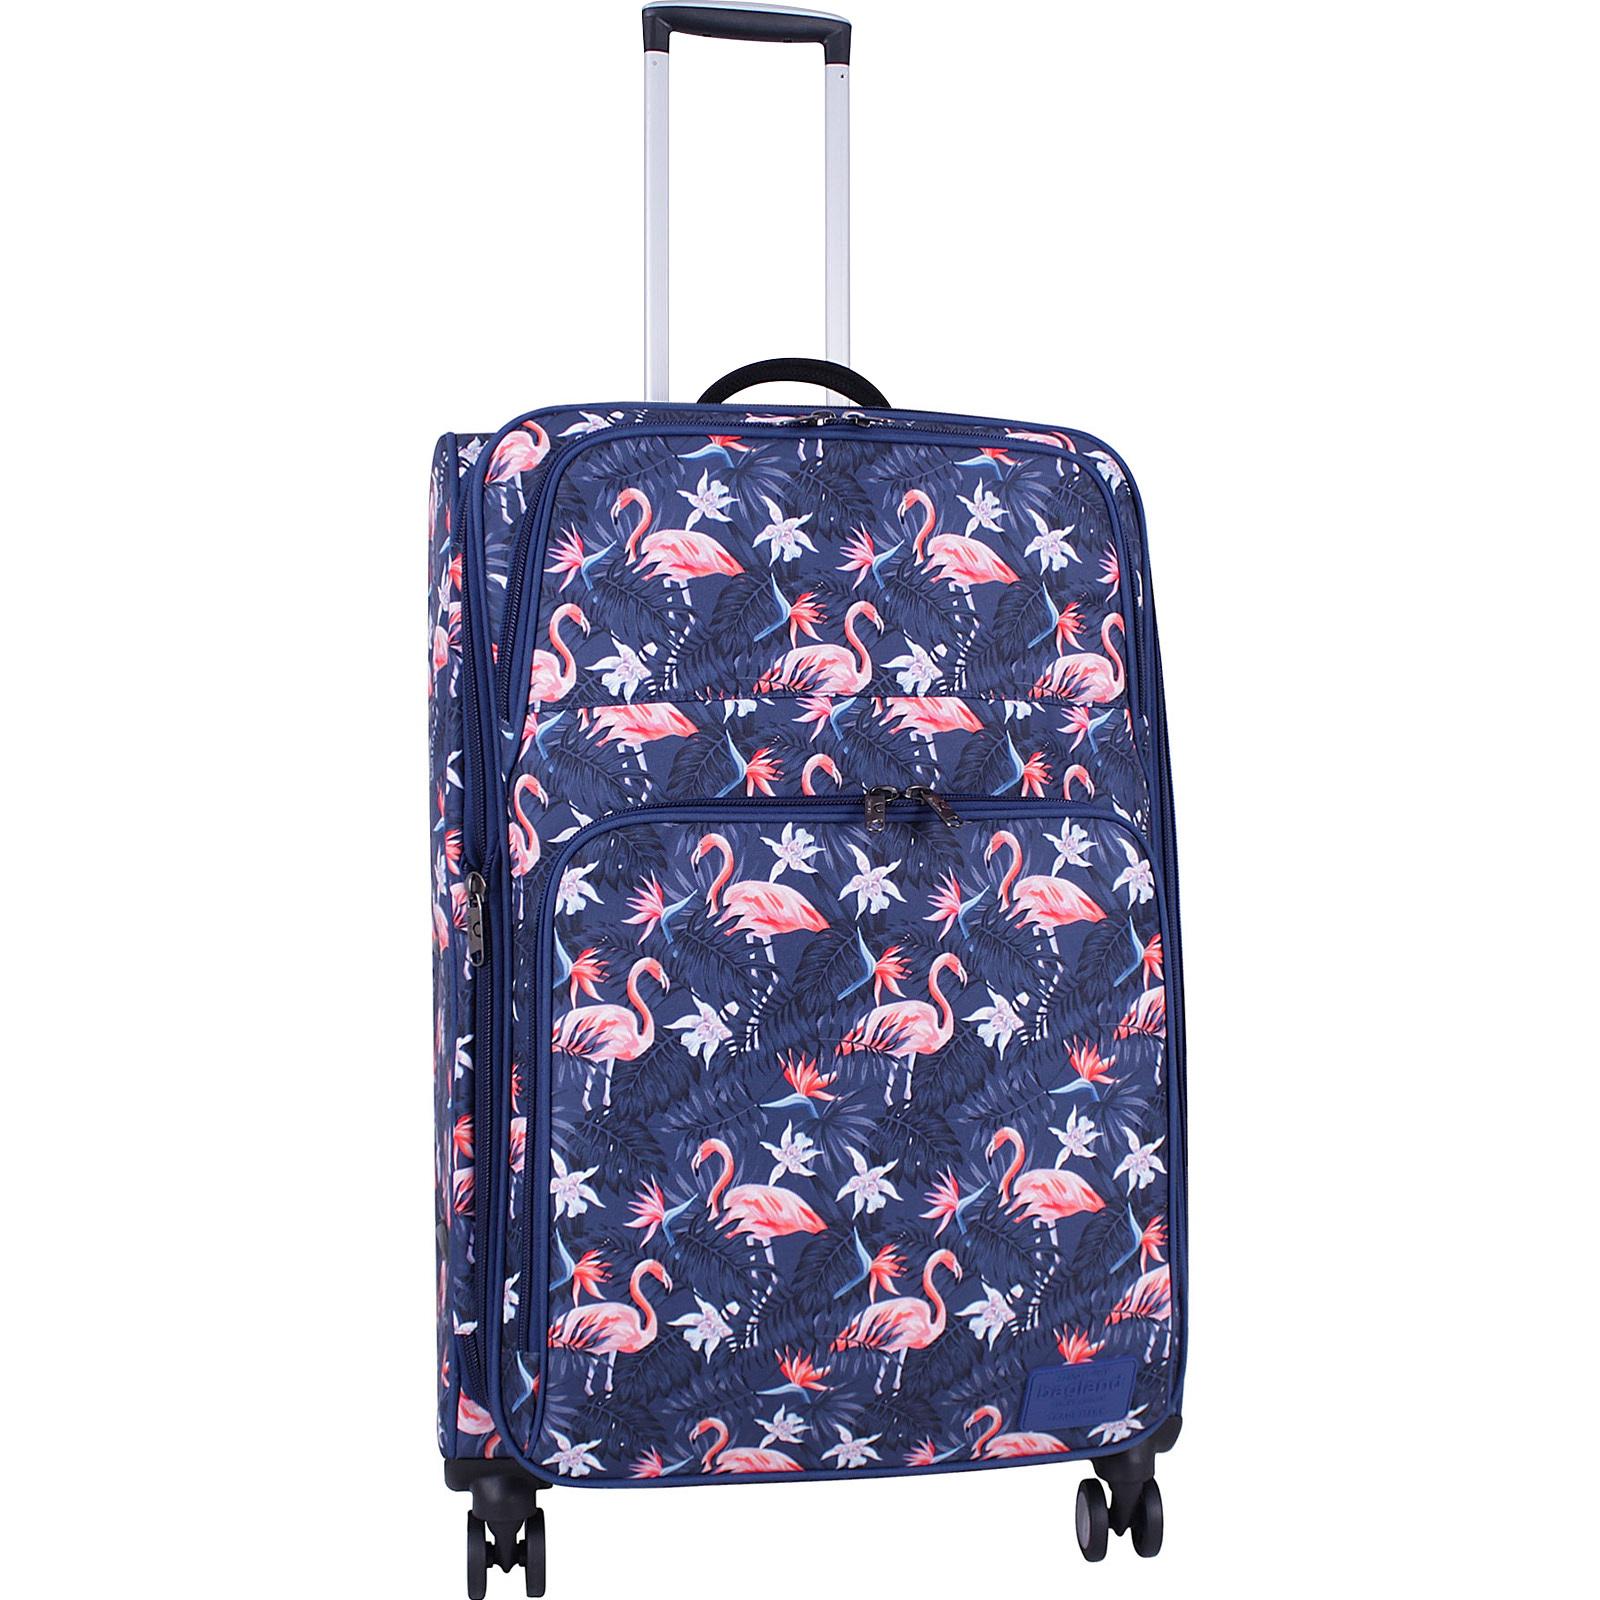 Дорожные чемоданы Чемодан Bagland Валенсия большой дизайн 83л. сублімація 762 (0037966274) IMG_8784_суб.762_.JPG